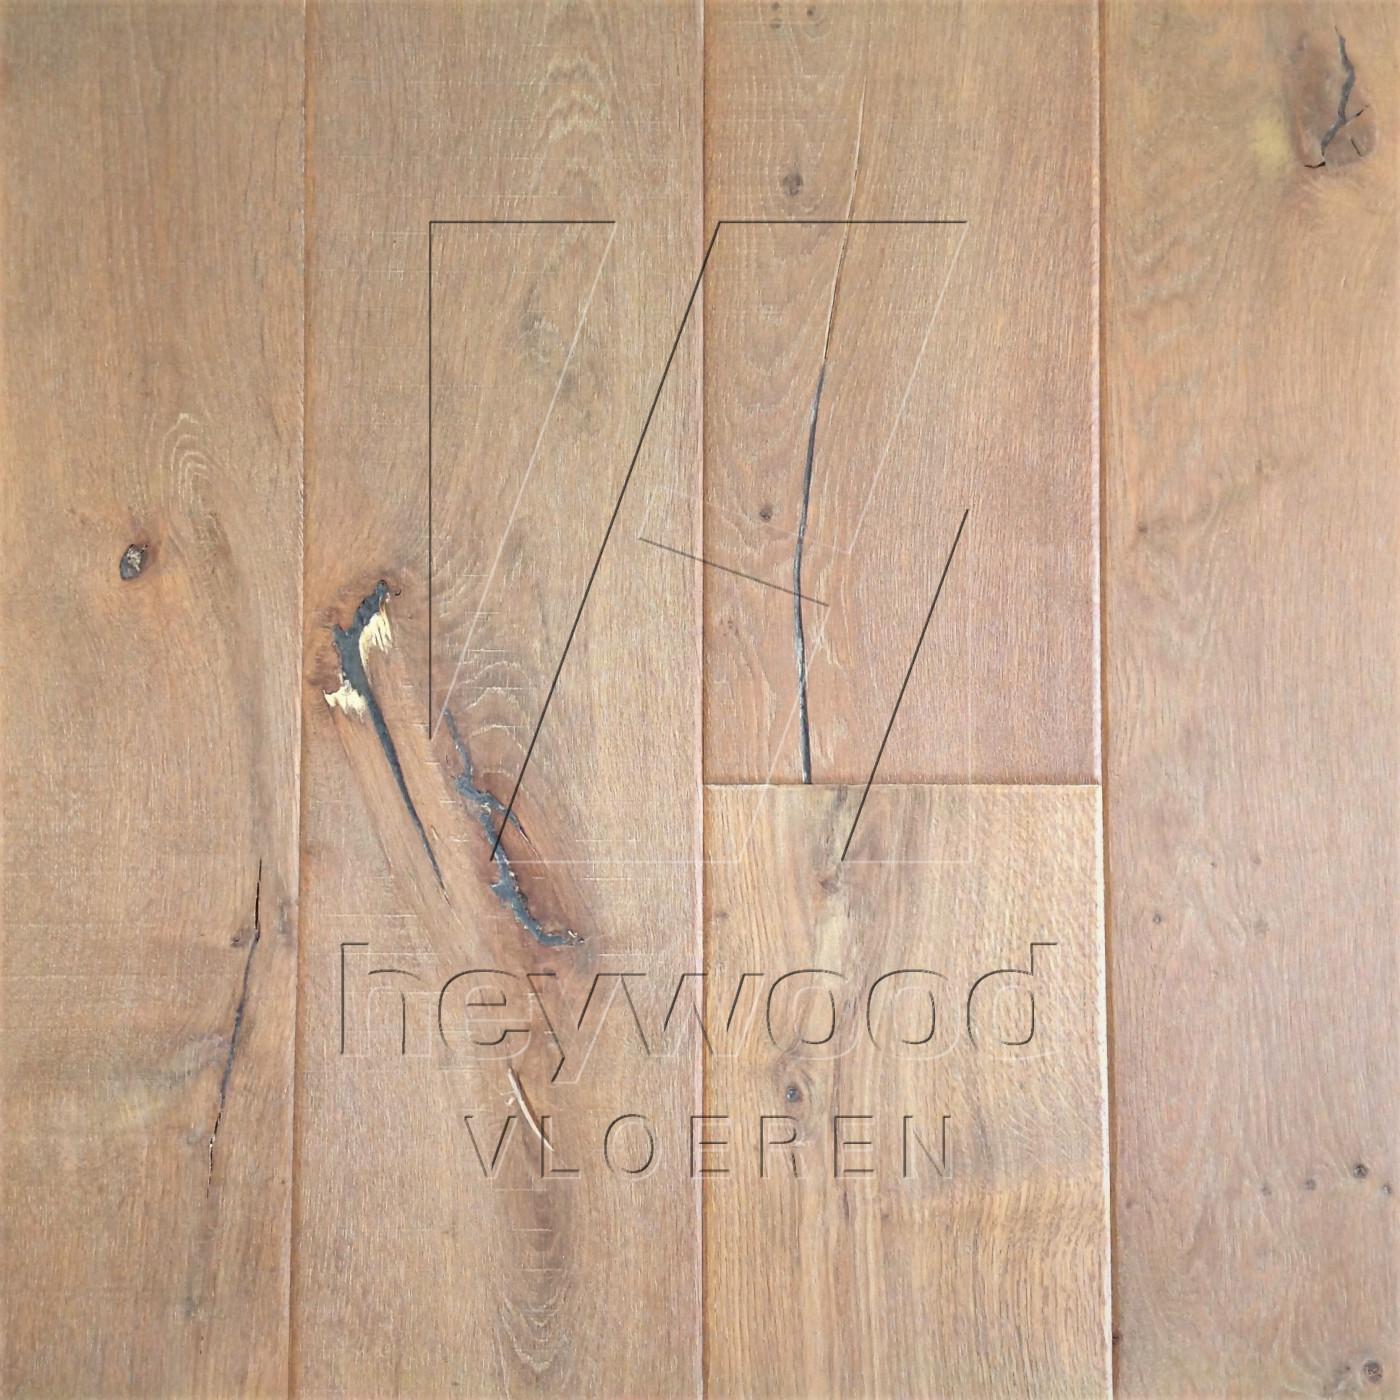 Shrunk Plank 'Vanoise' in Aged Shrunk surface of Aged Hardwood Floors